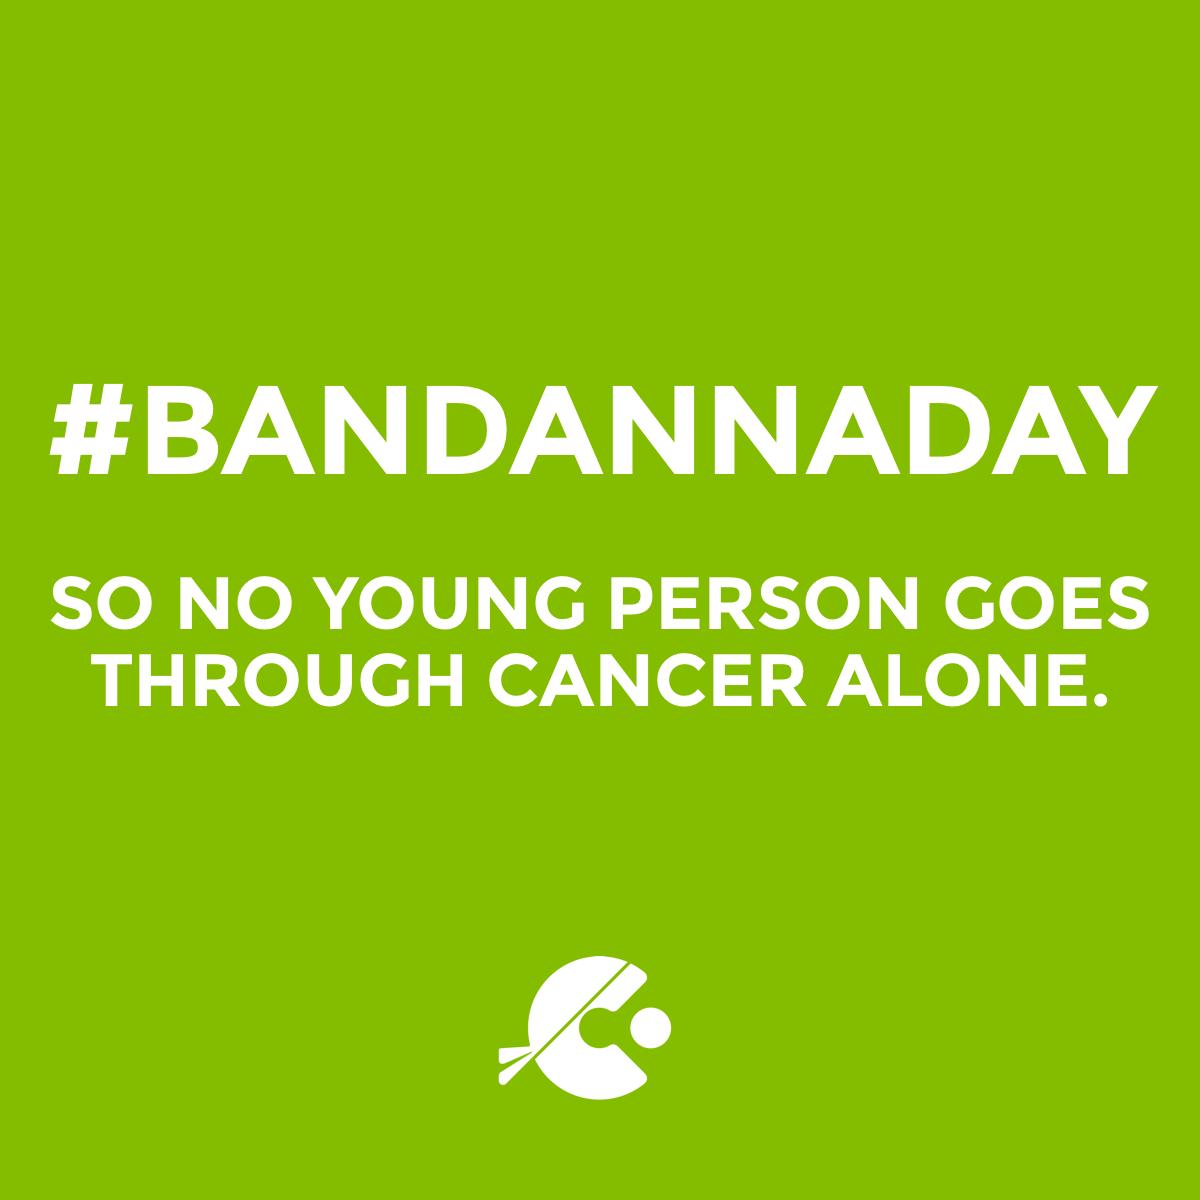 #bandannaday